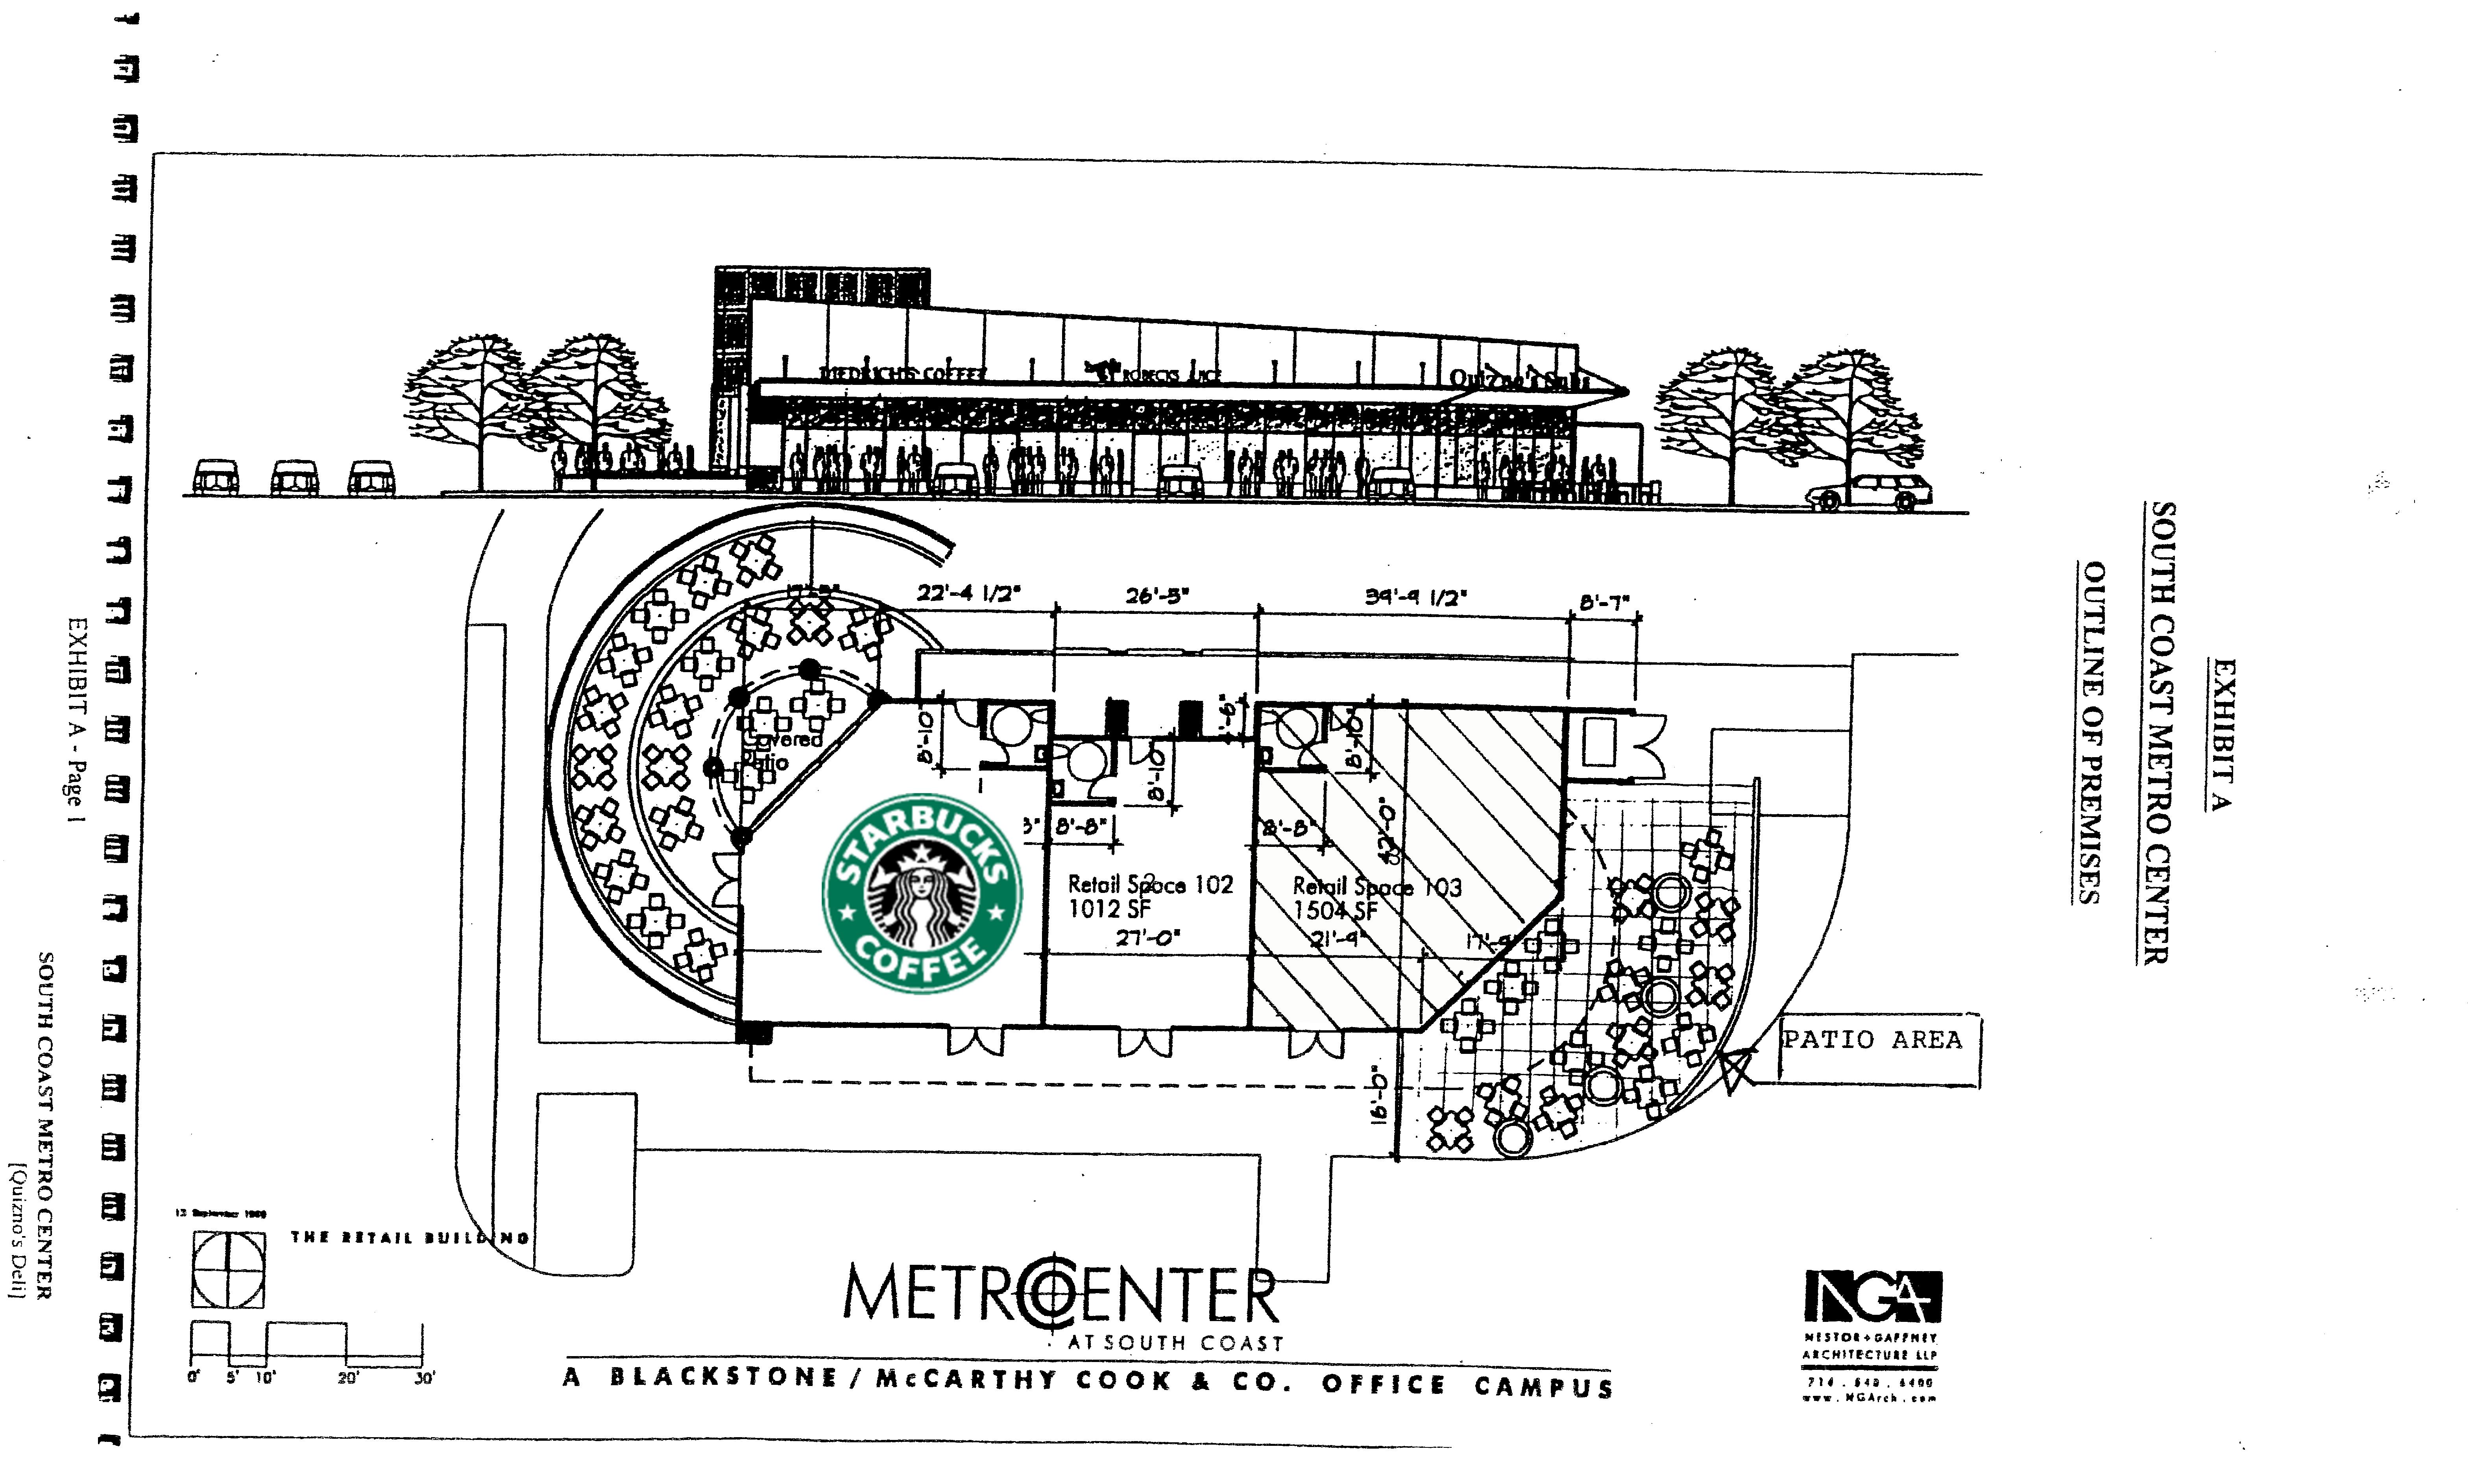 545 Anton Blvd: site plan